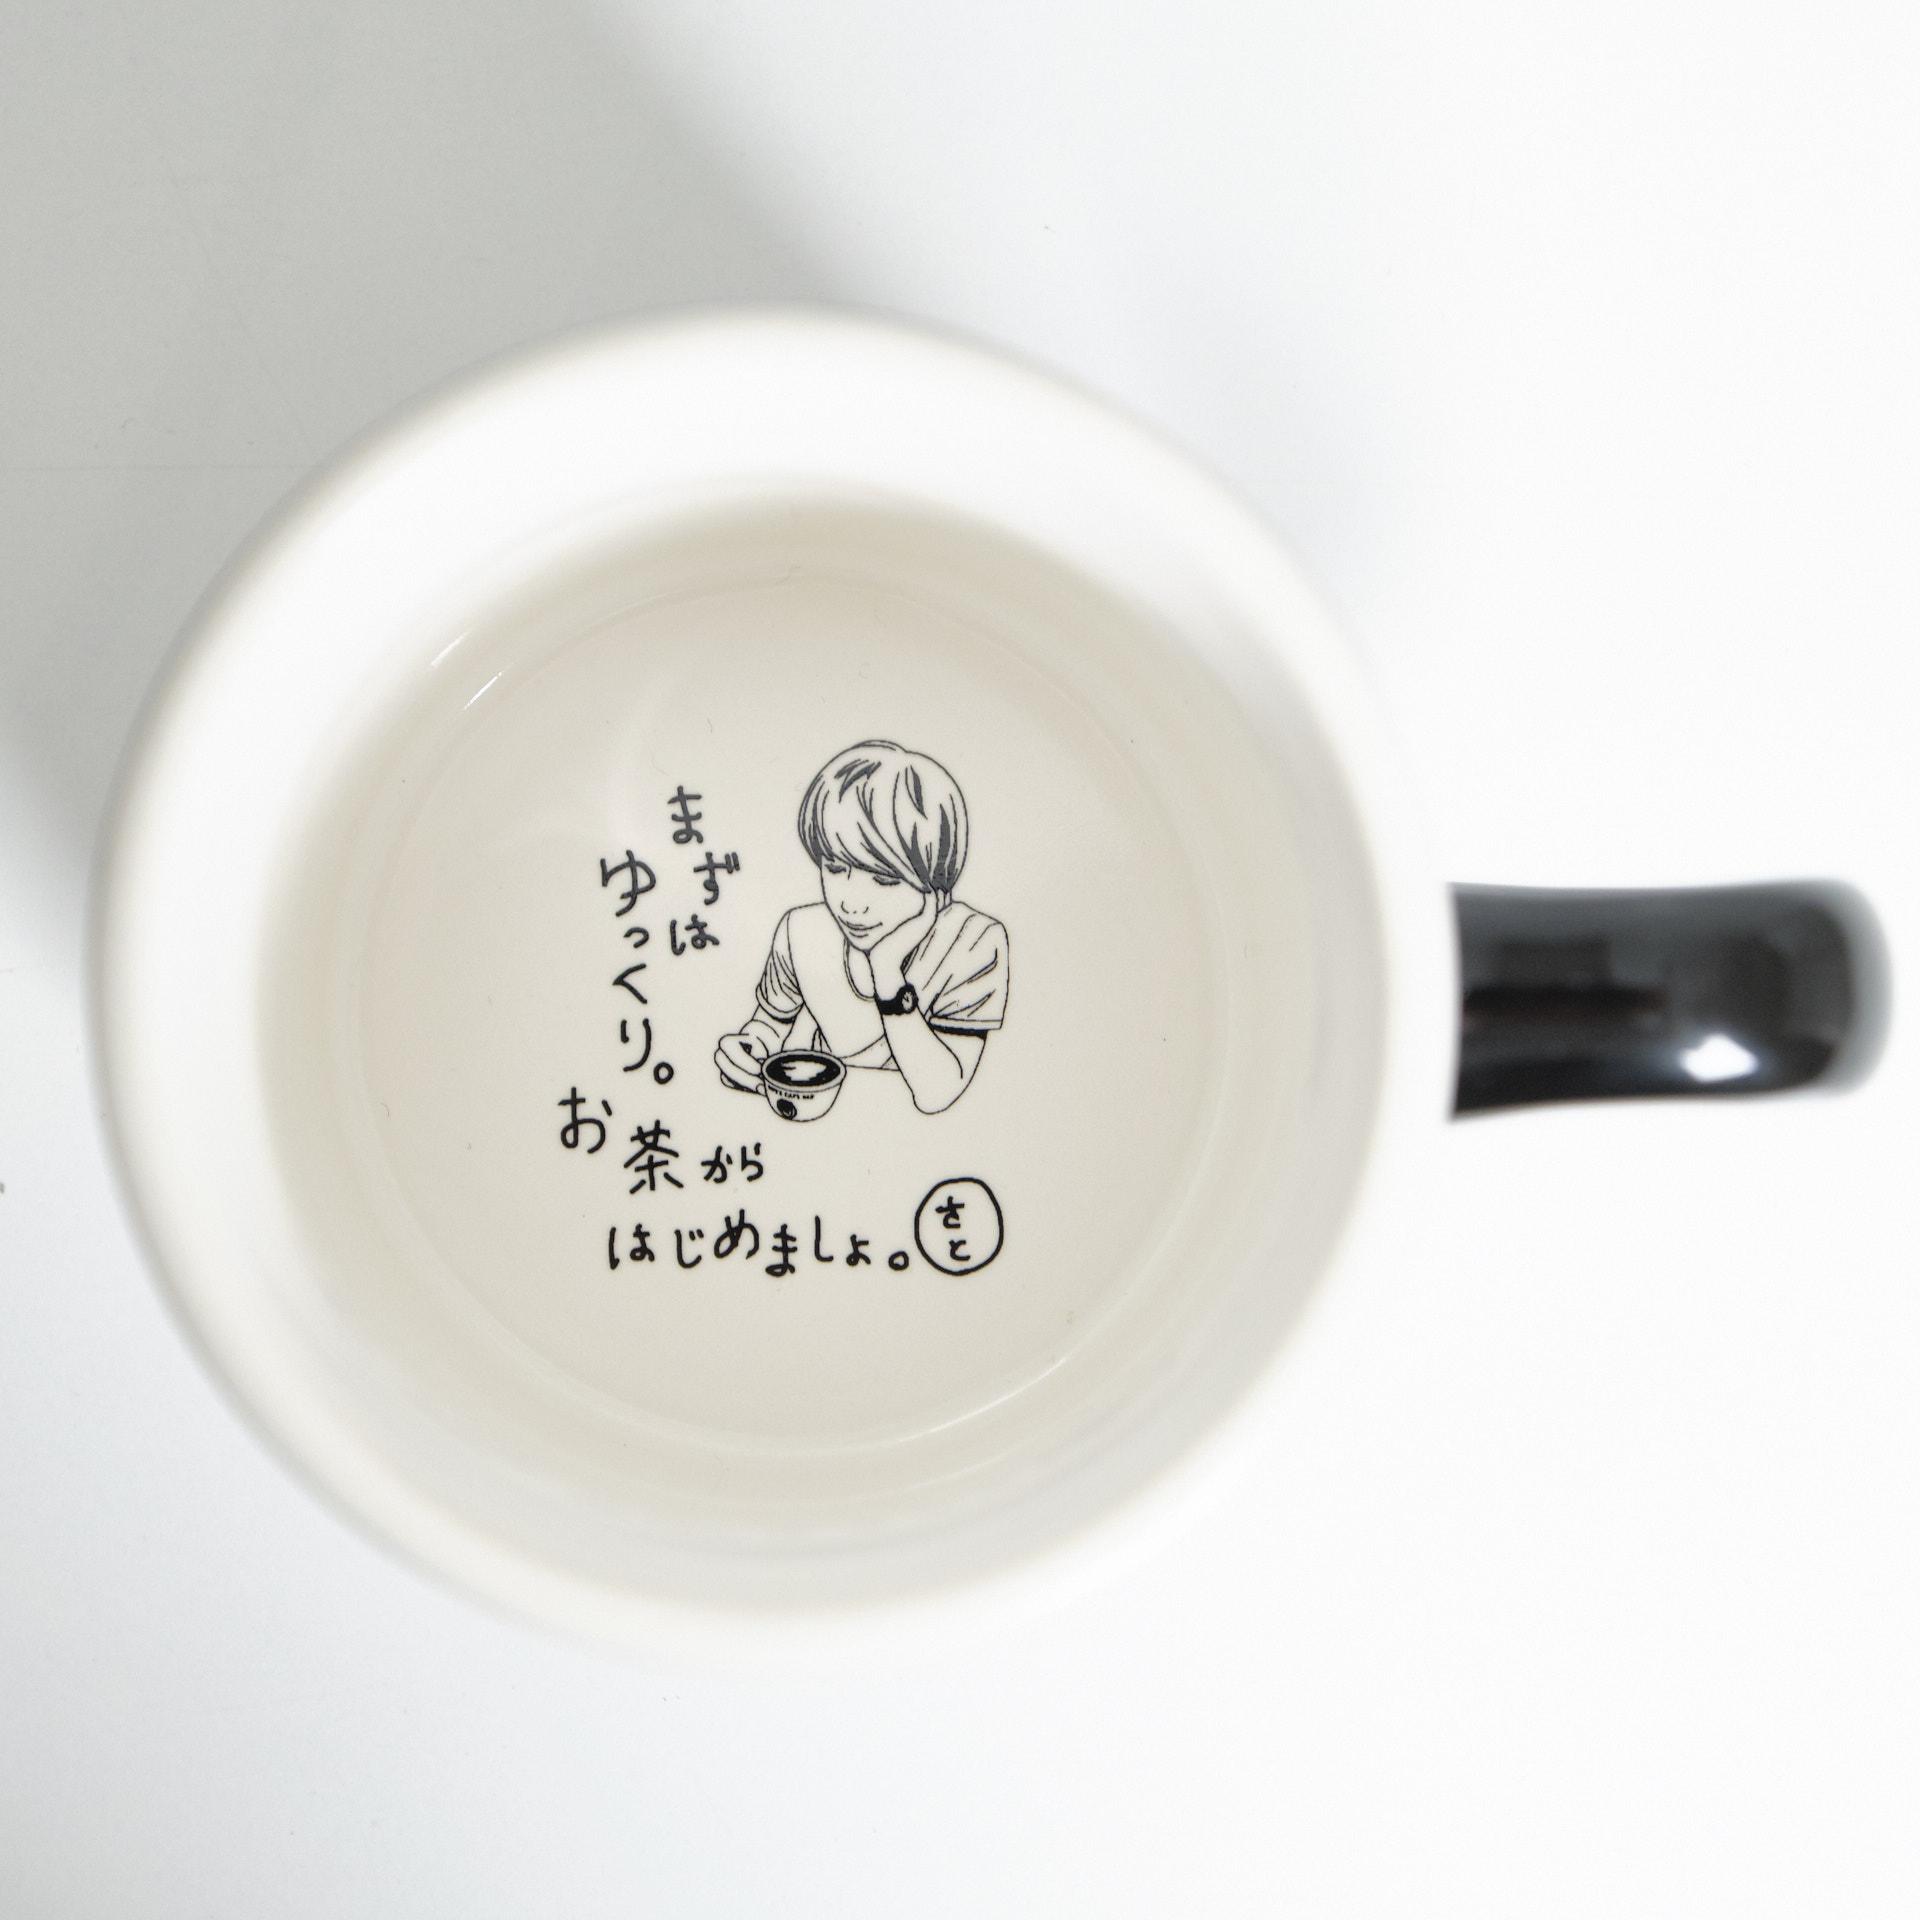 2020.7.3 Sato's Cafe Bar マグカップ18856.jpg